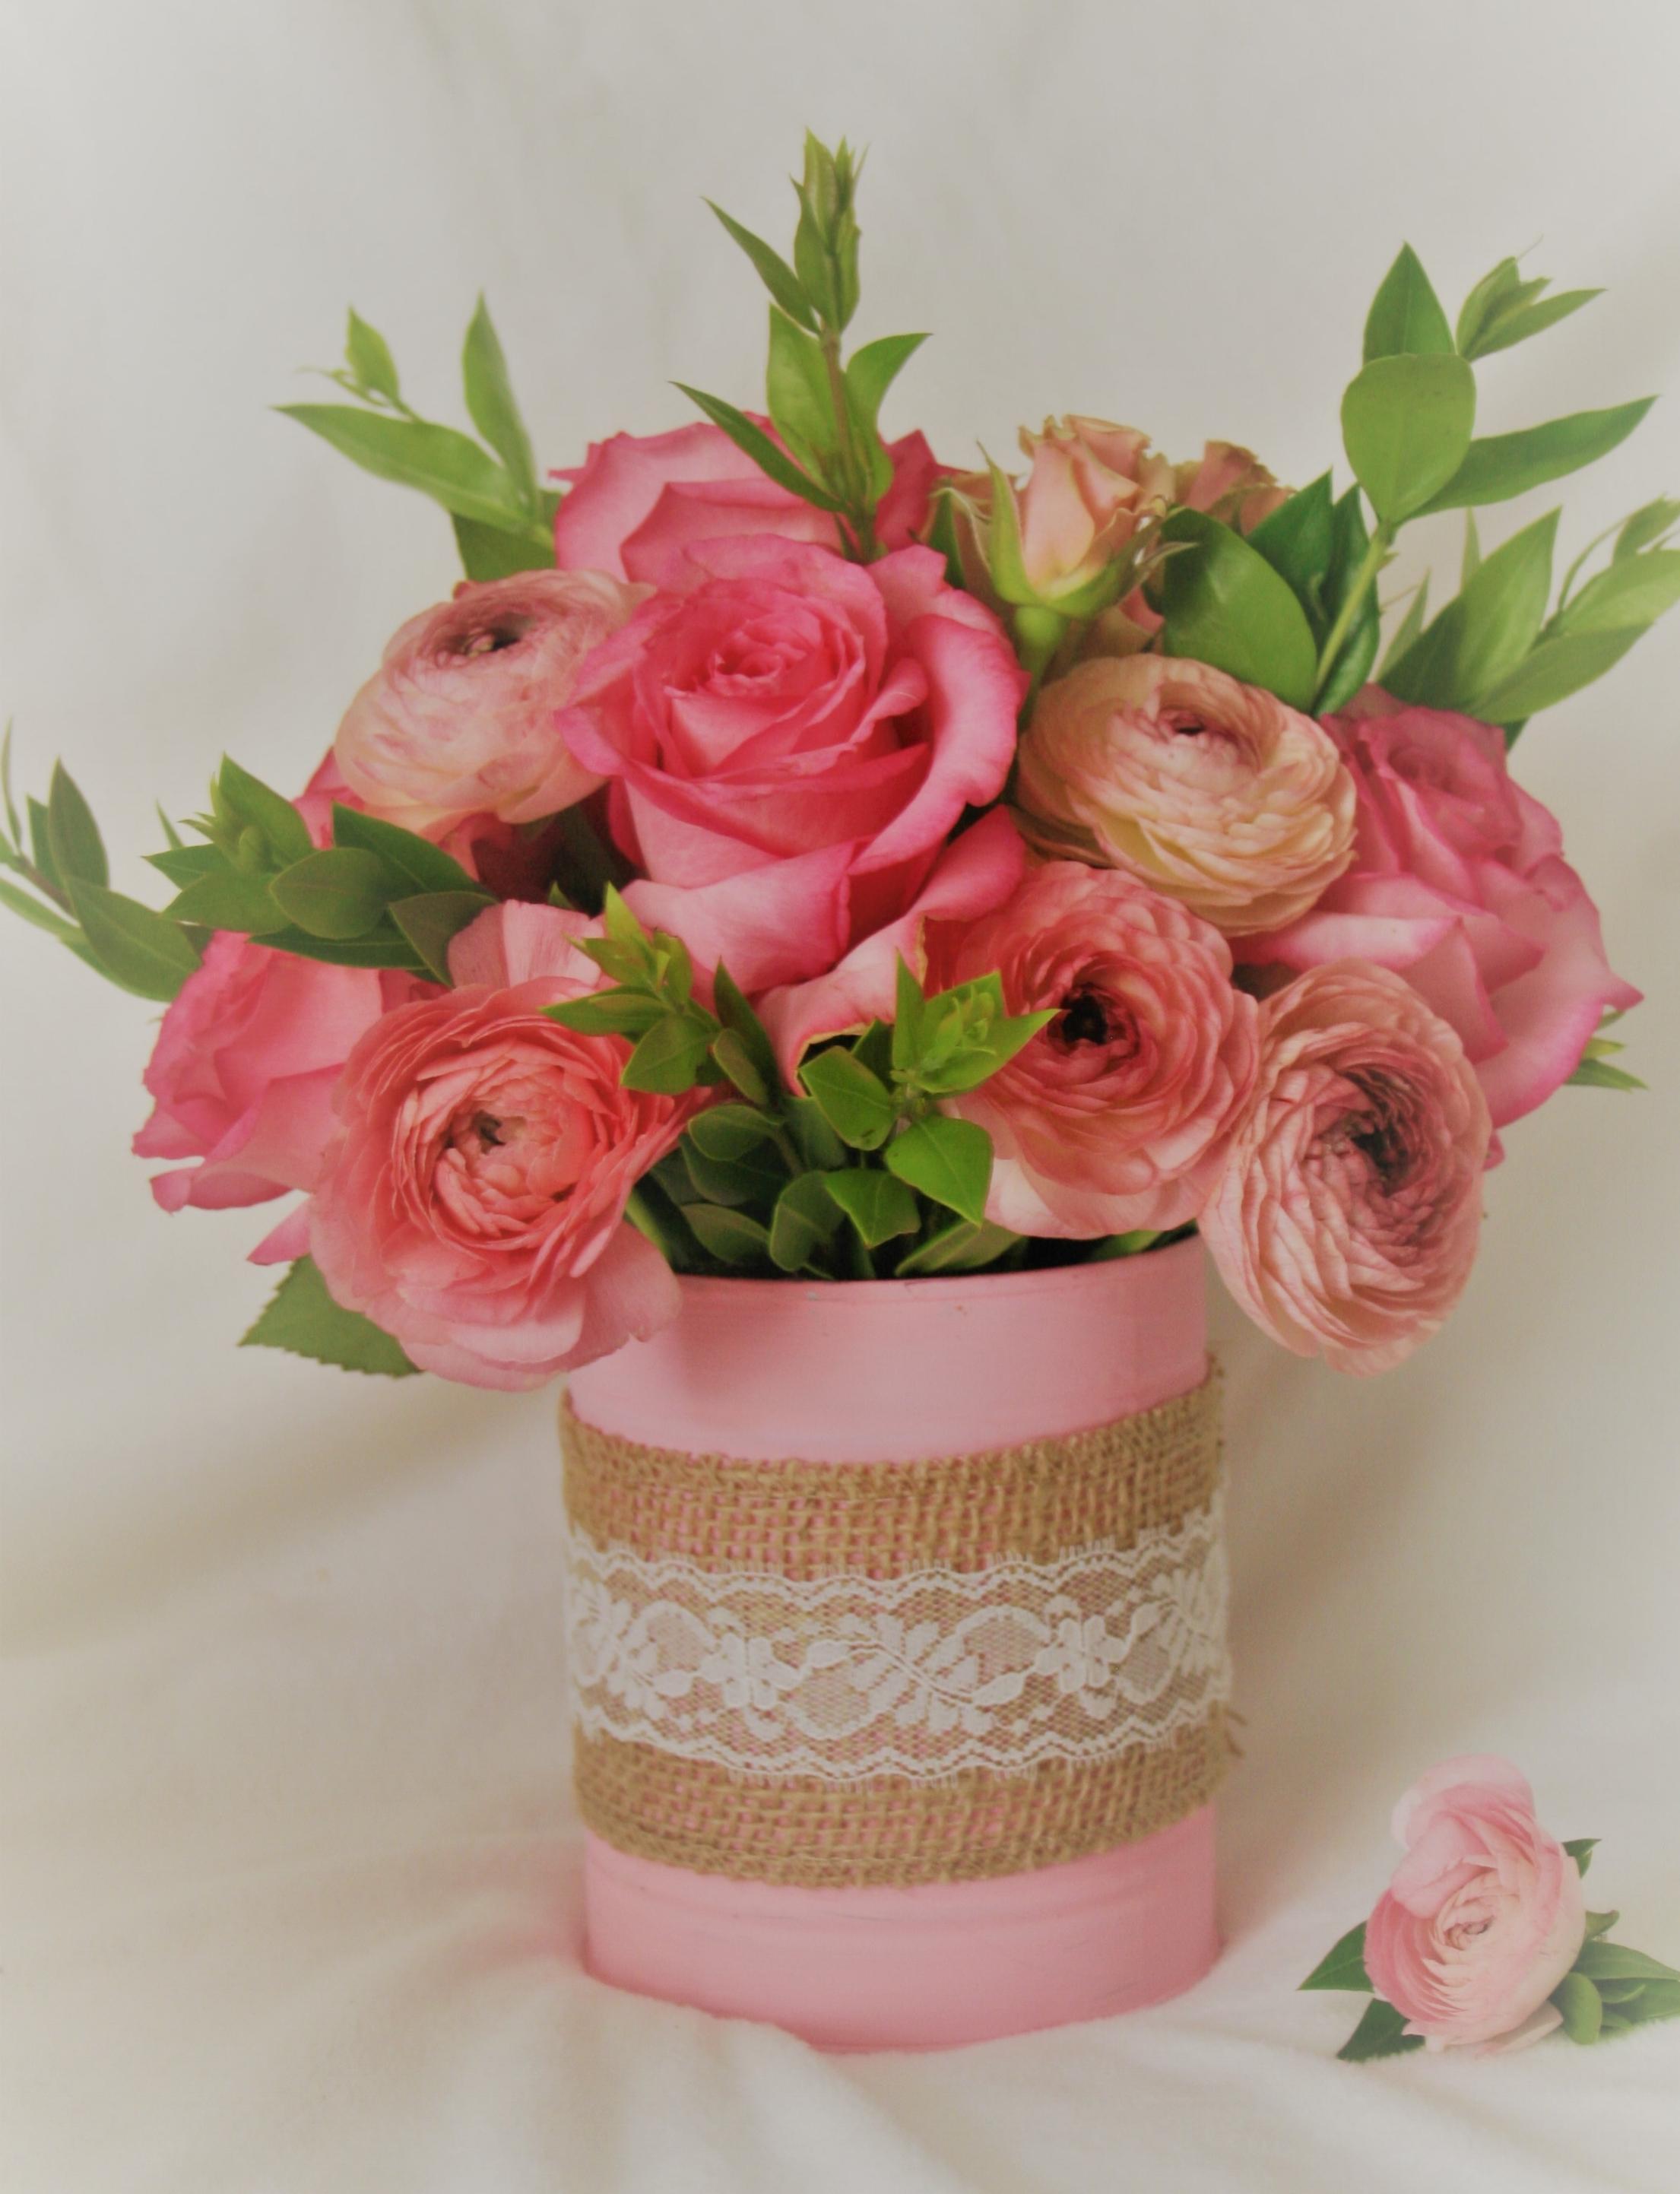 Small arrangement